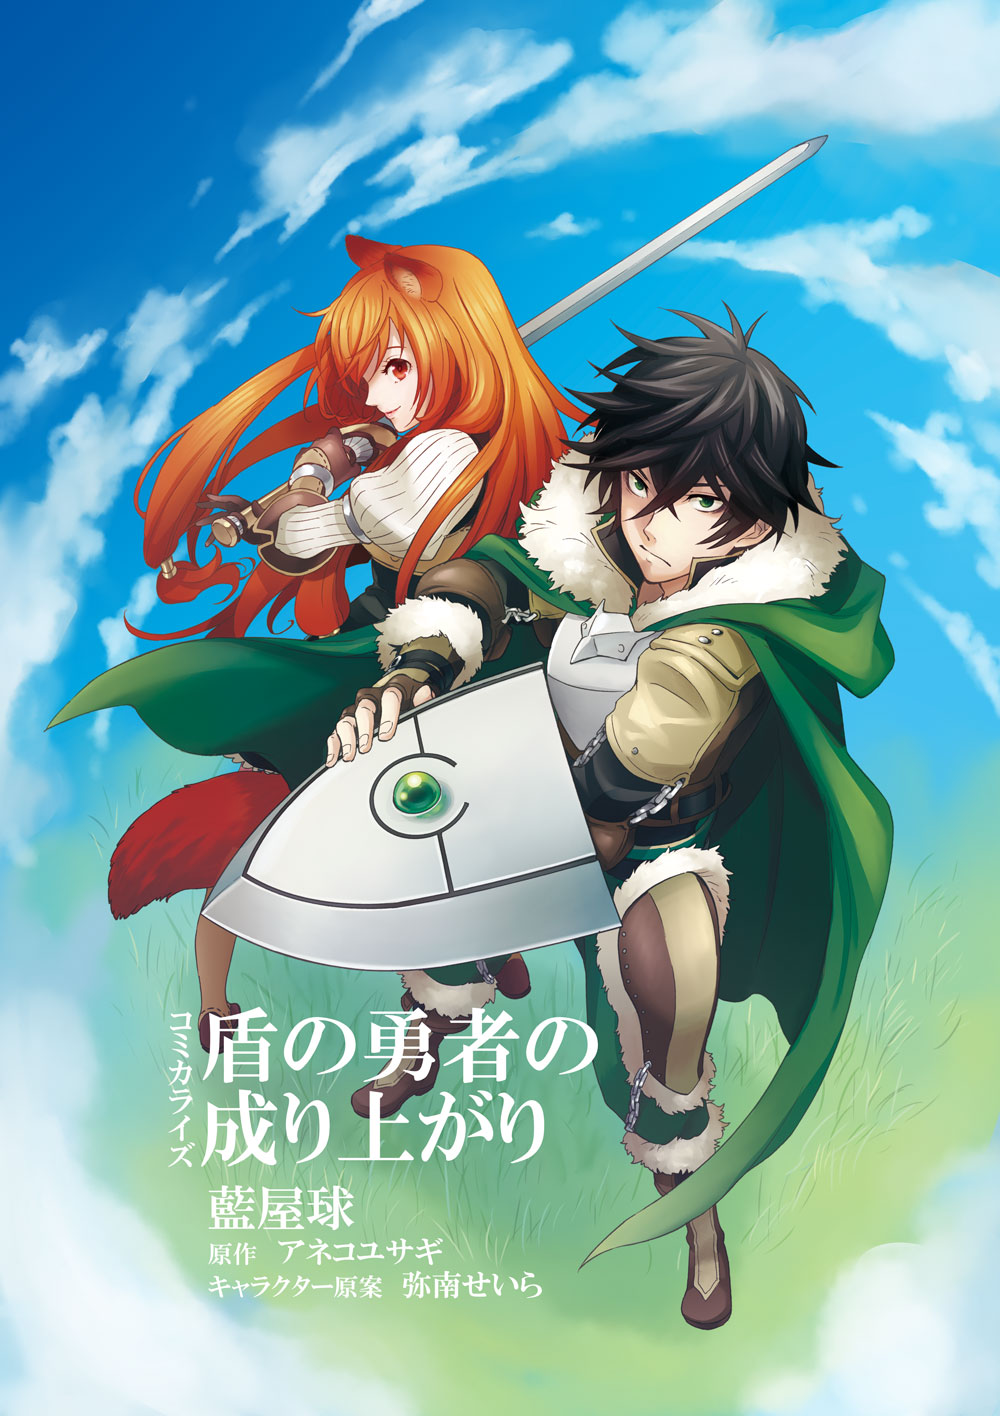 List of Web Novel Arcs | The Rising of the Shield Hero Wiki